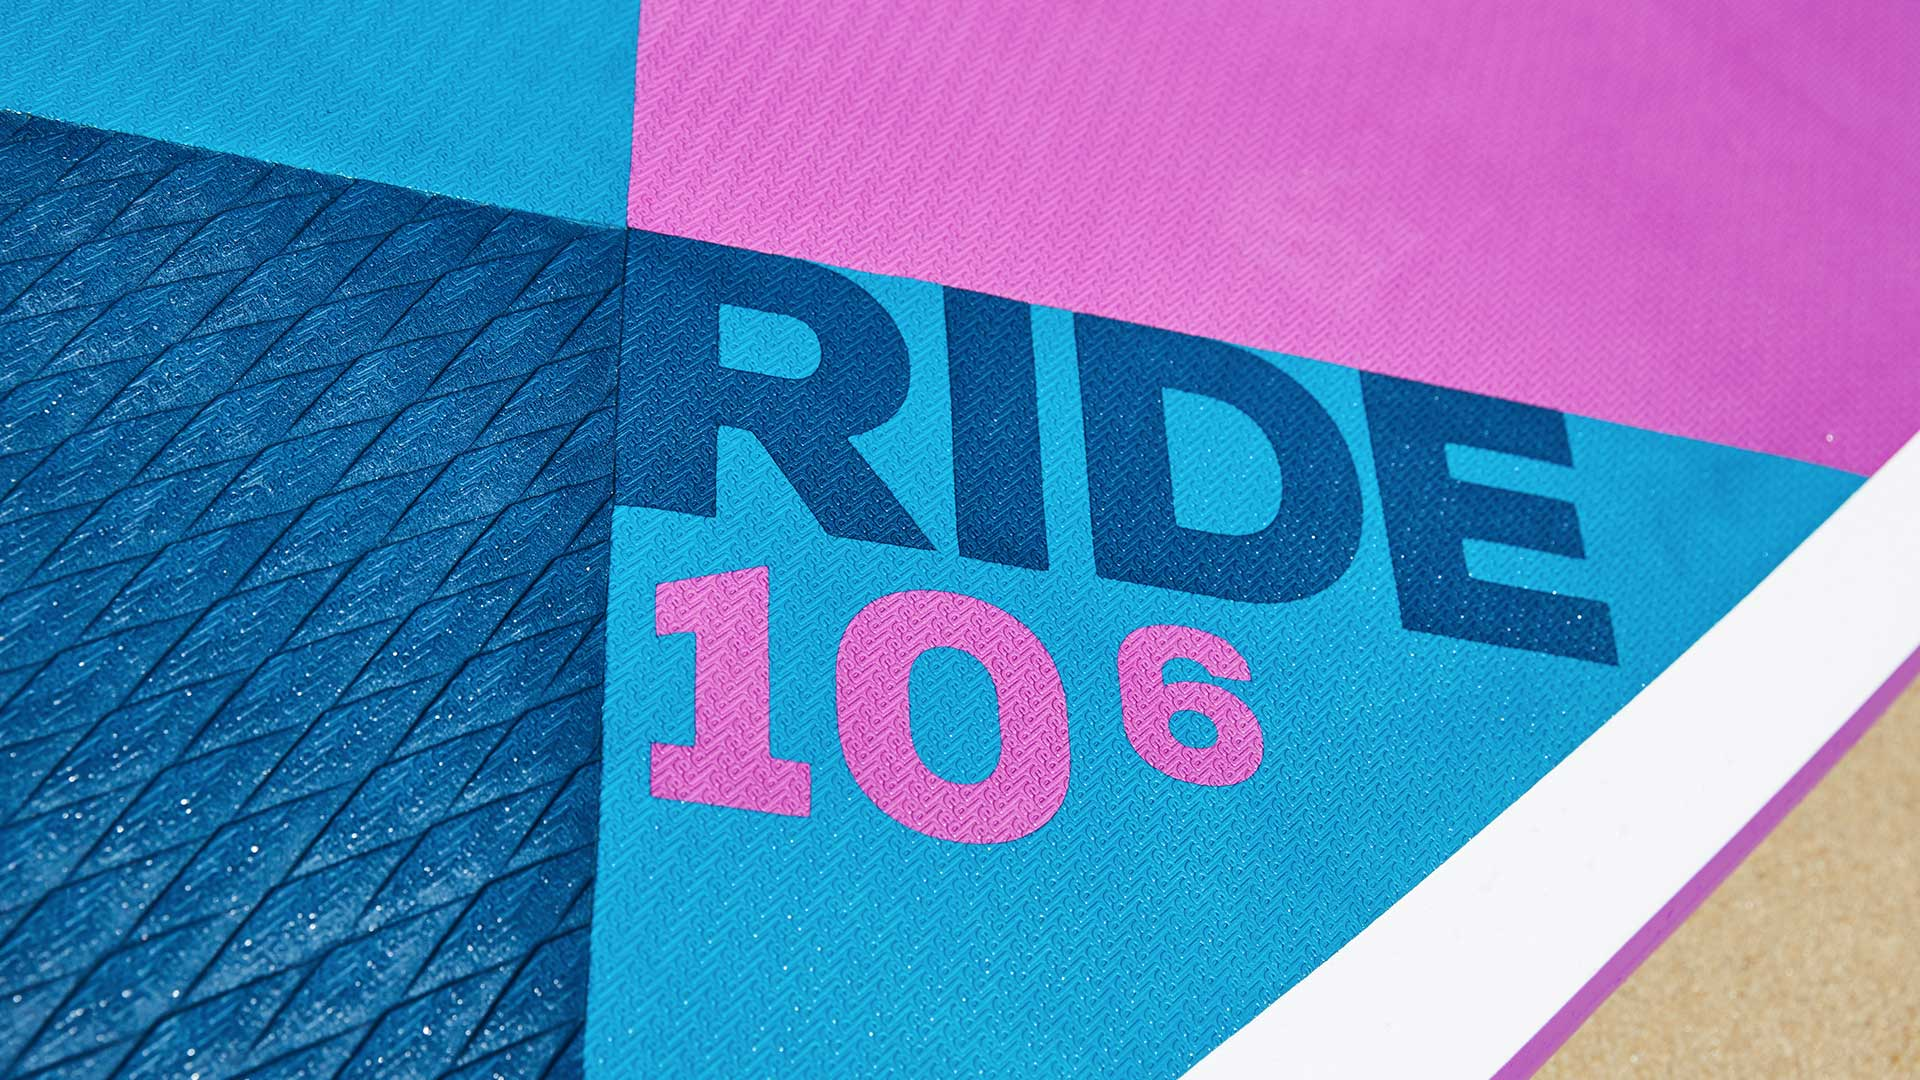 redpaddleco-106-ride-se-msl-inflatable-paddle-board-desktop-gallery-deckpad